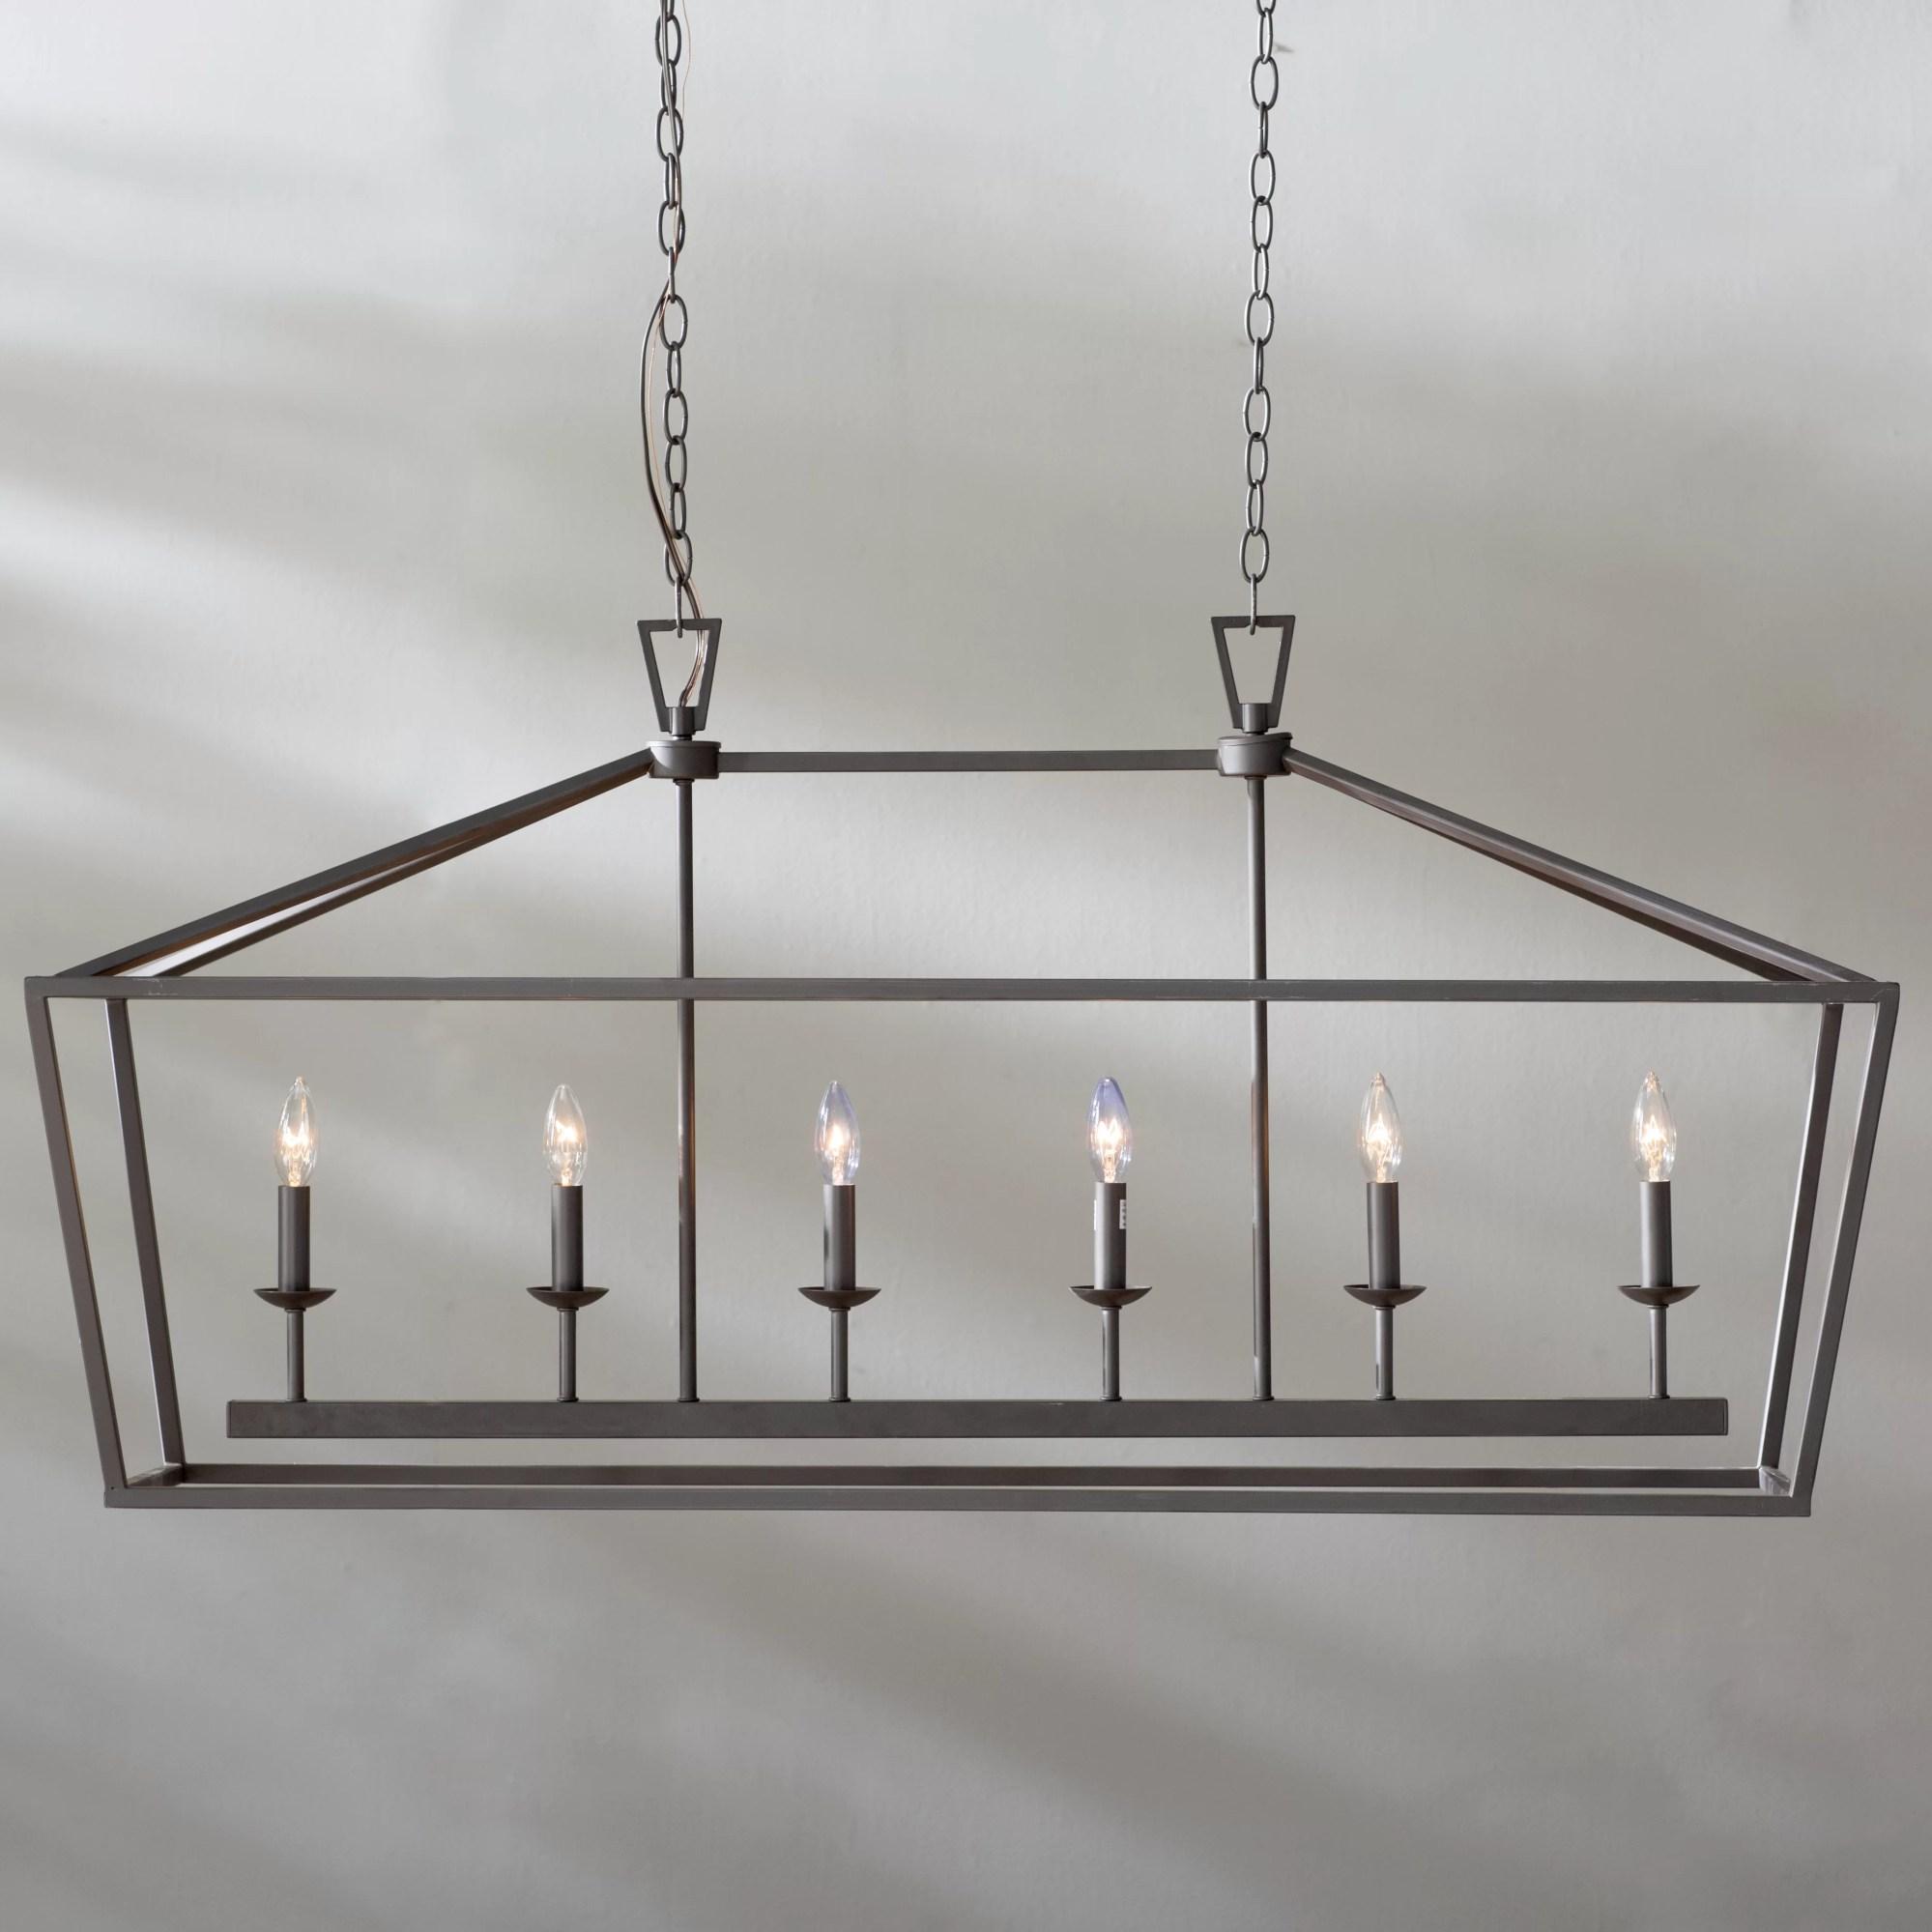 hight resolution of laurel foundry modern farmhouse carmen 6 light kitchen island pendant reviews wayfair